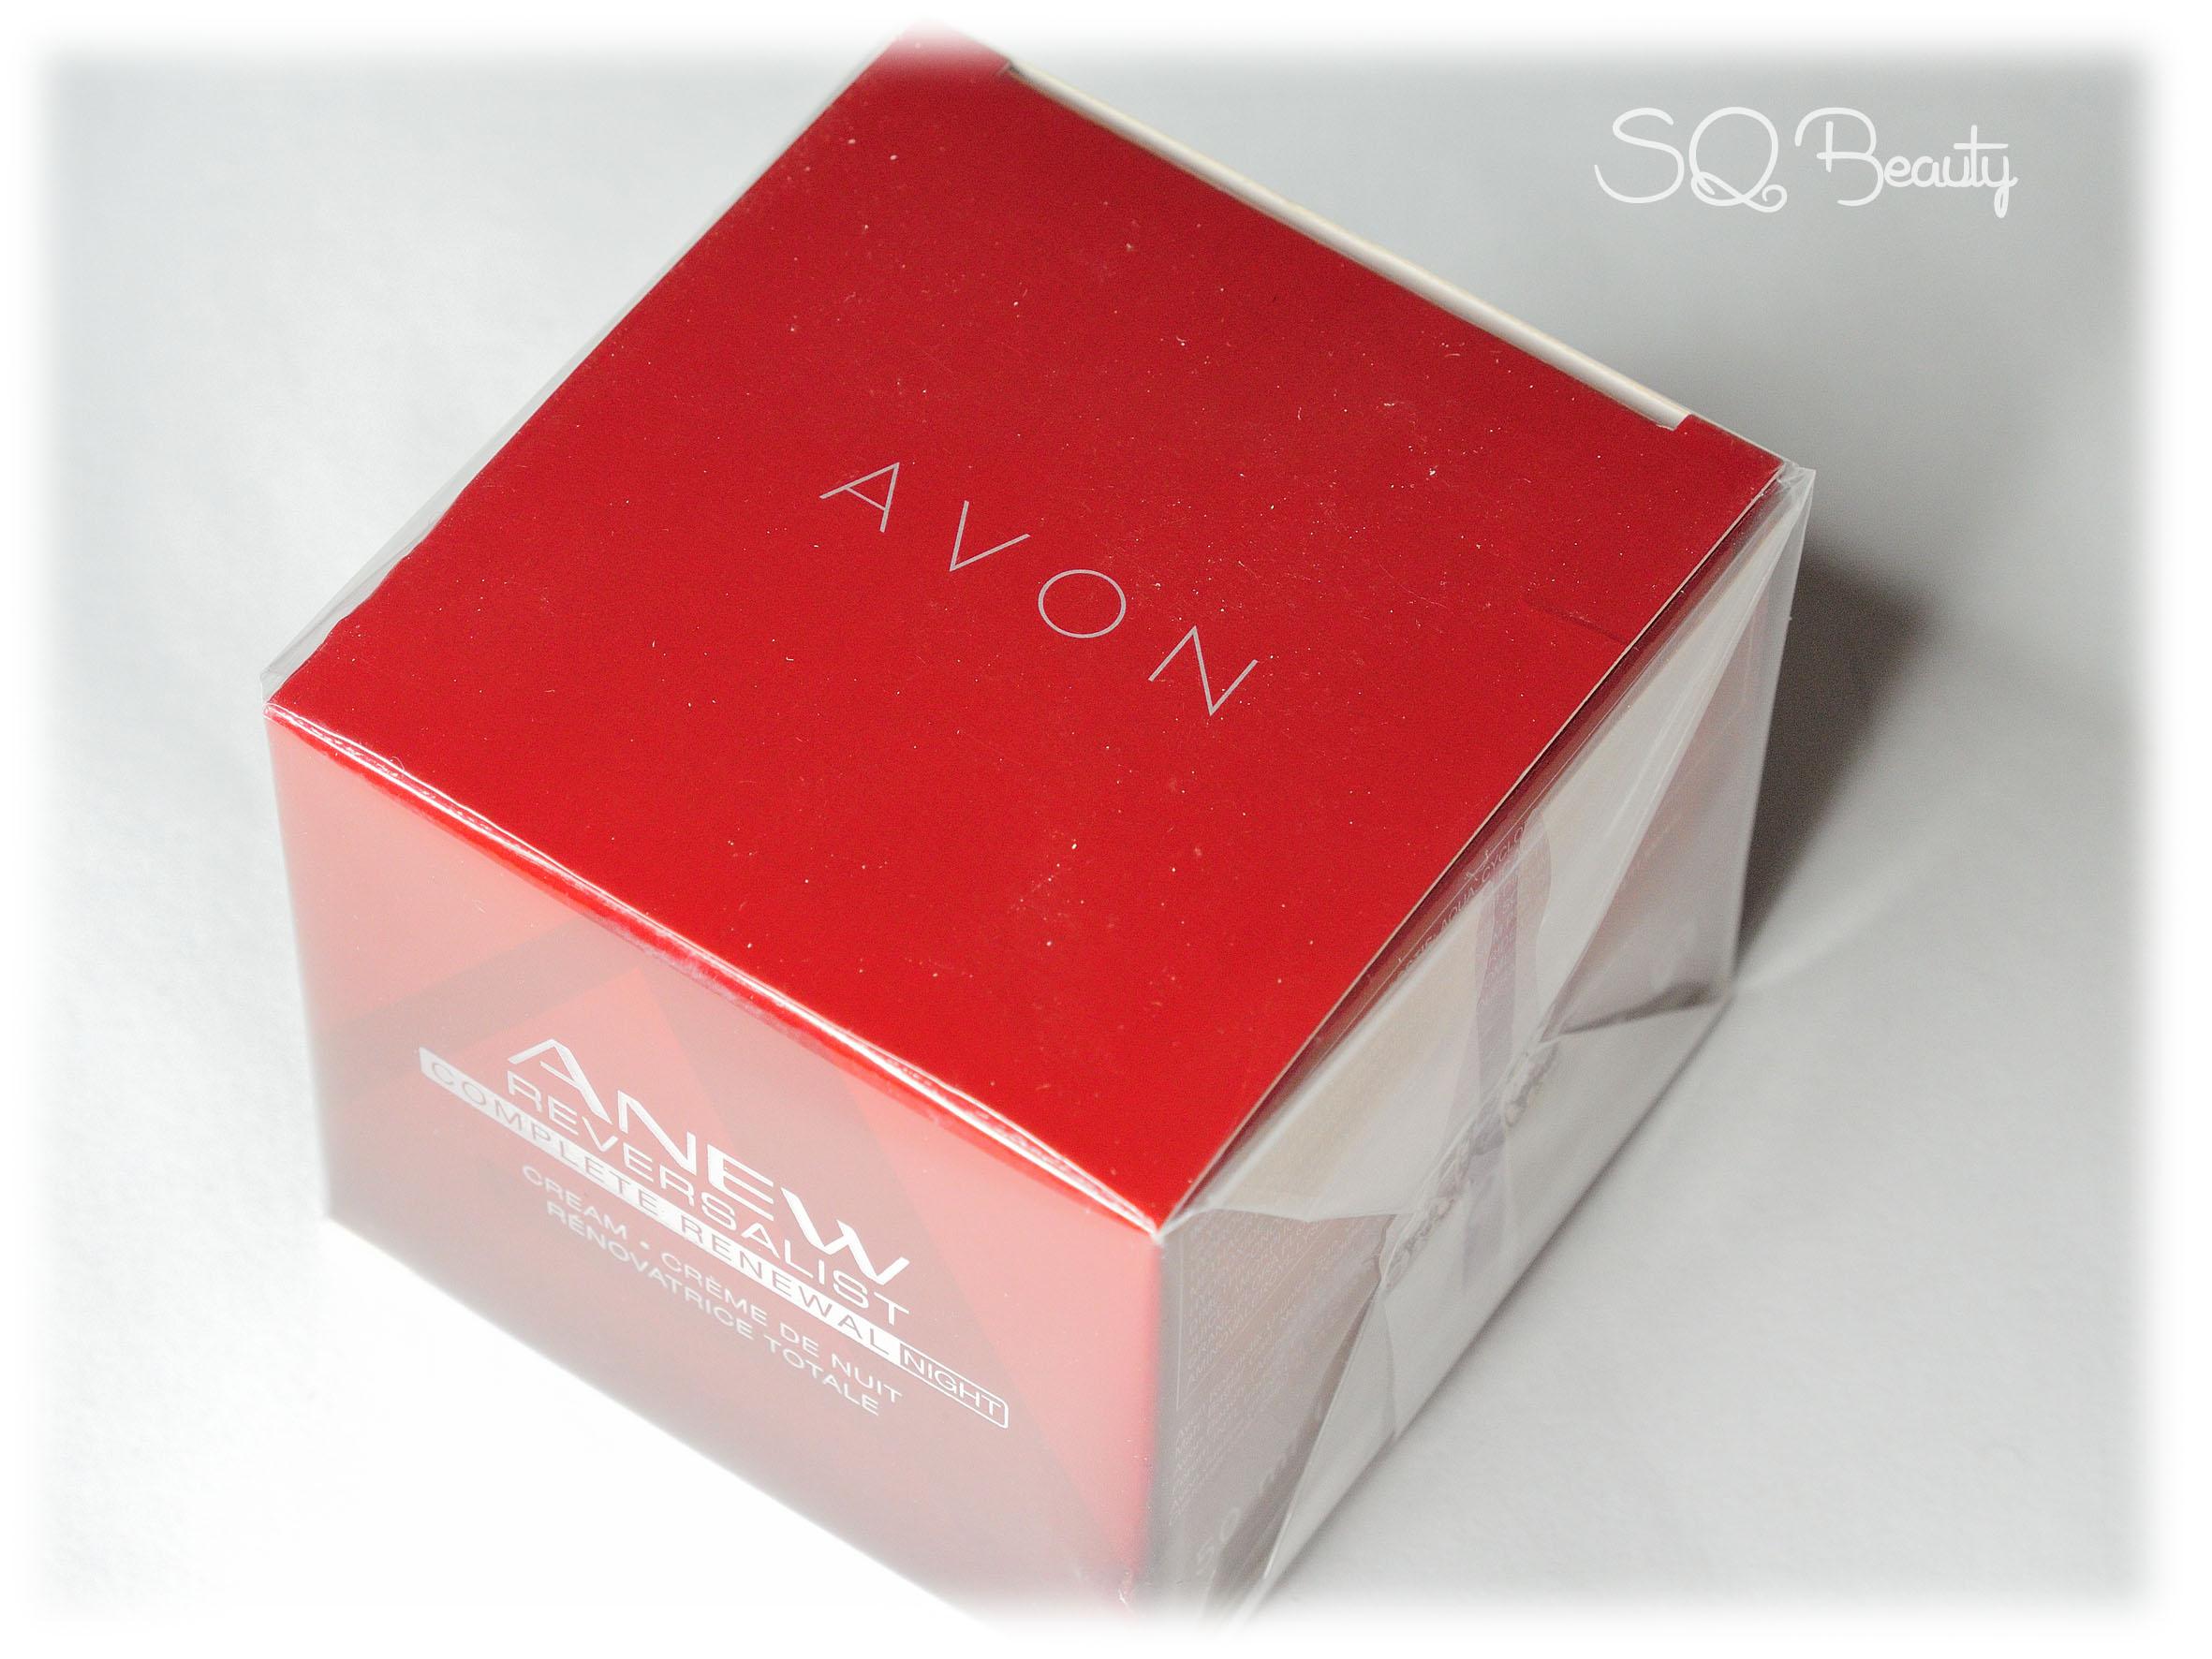 Avon Anew +40 Silvia Quiros SQ Beauty